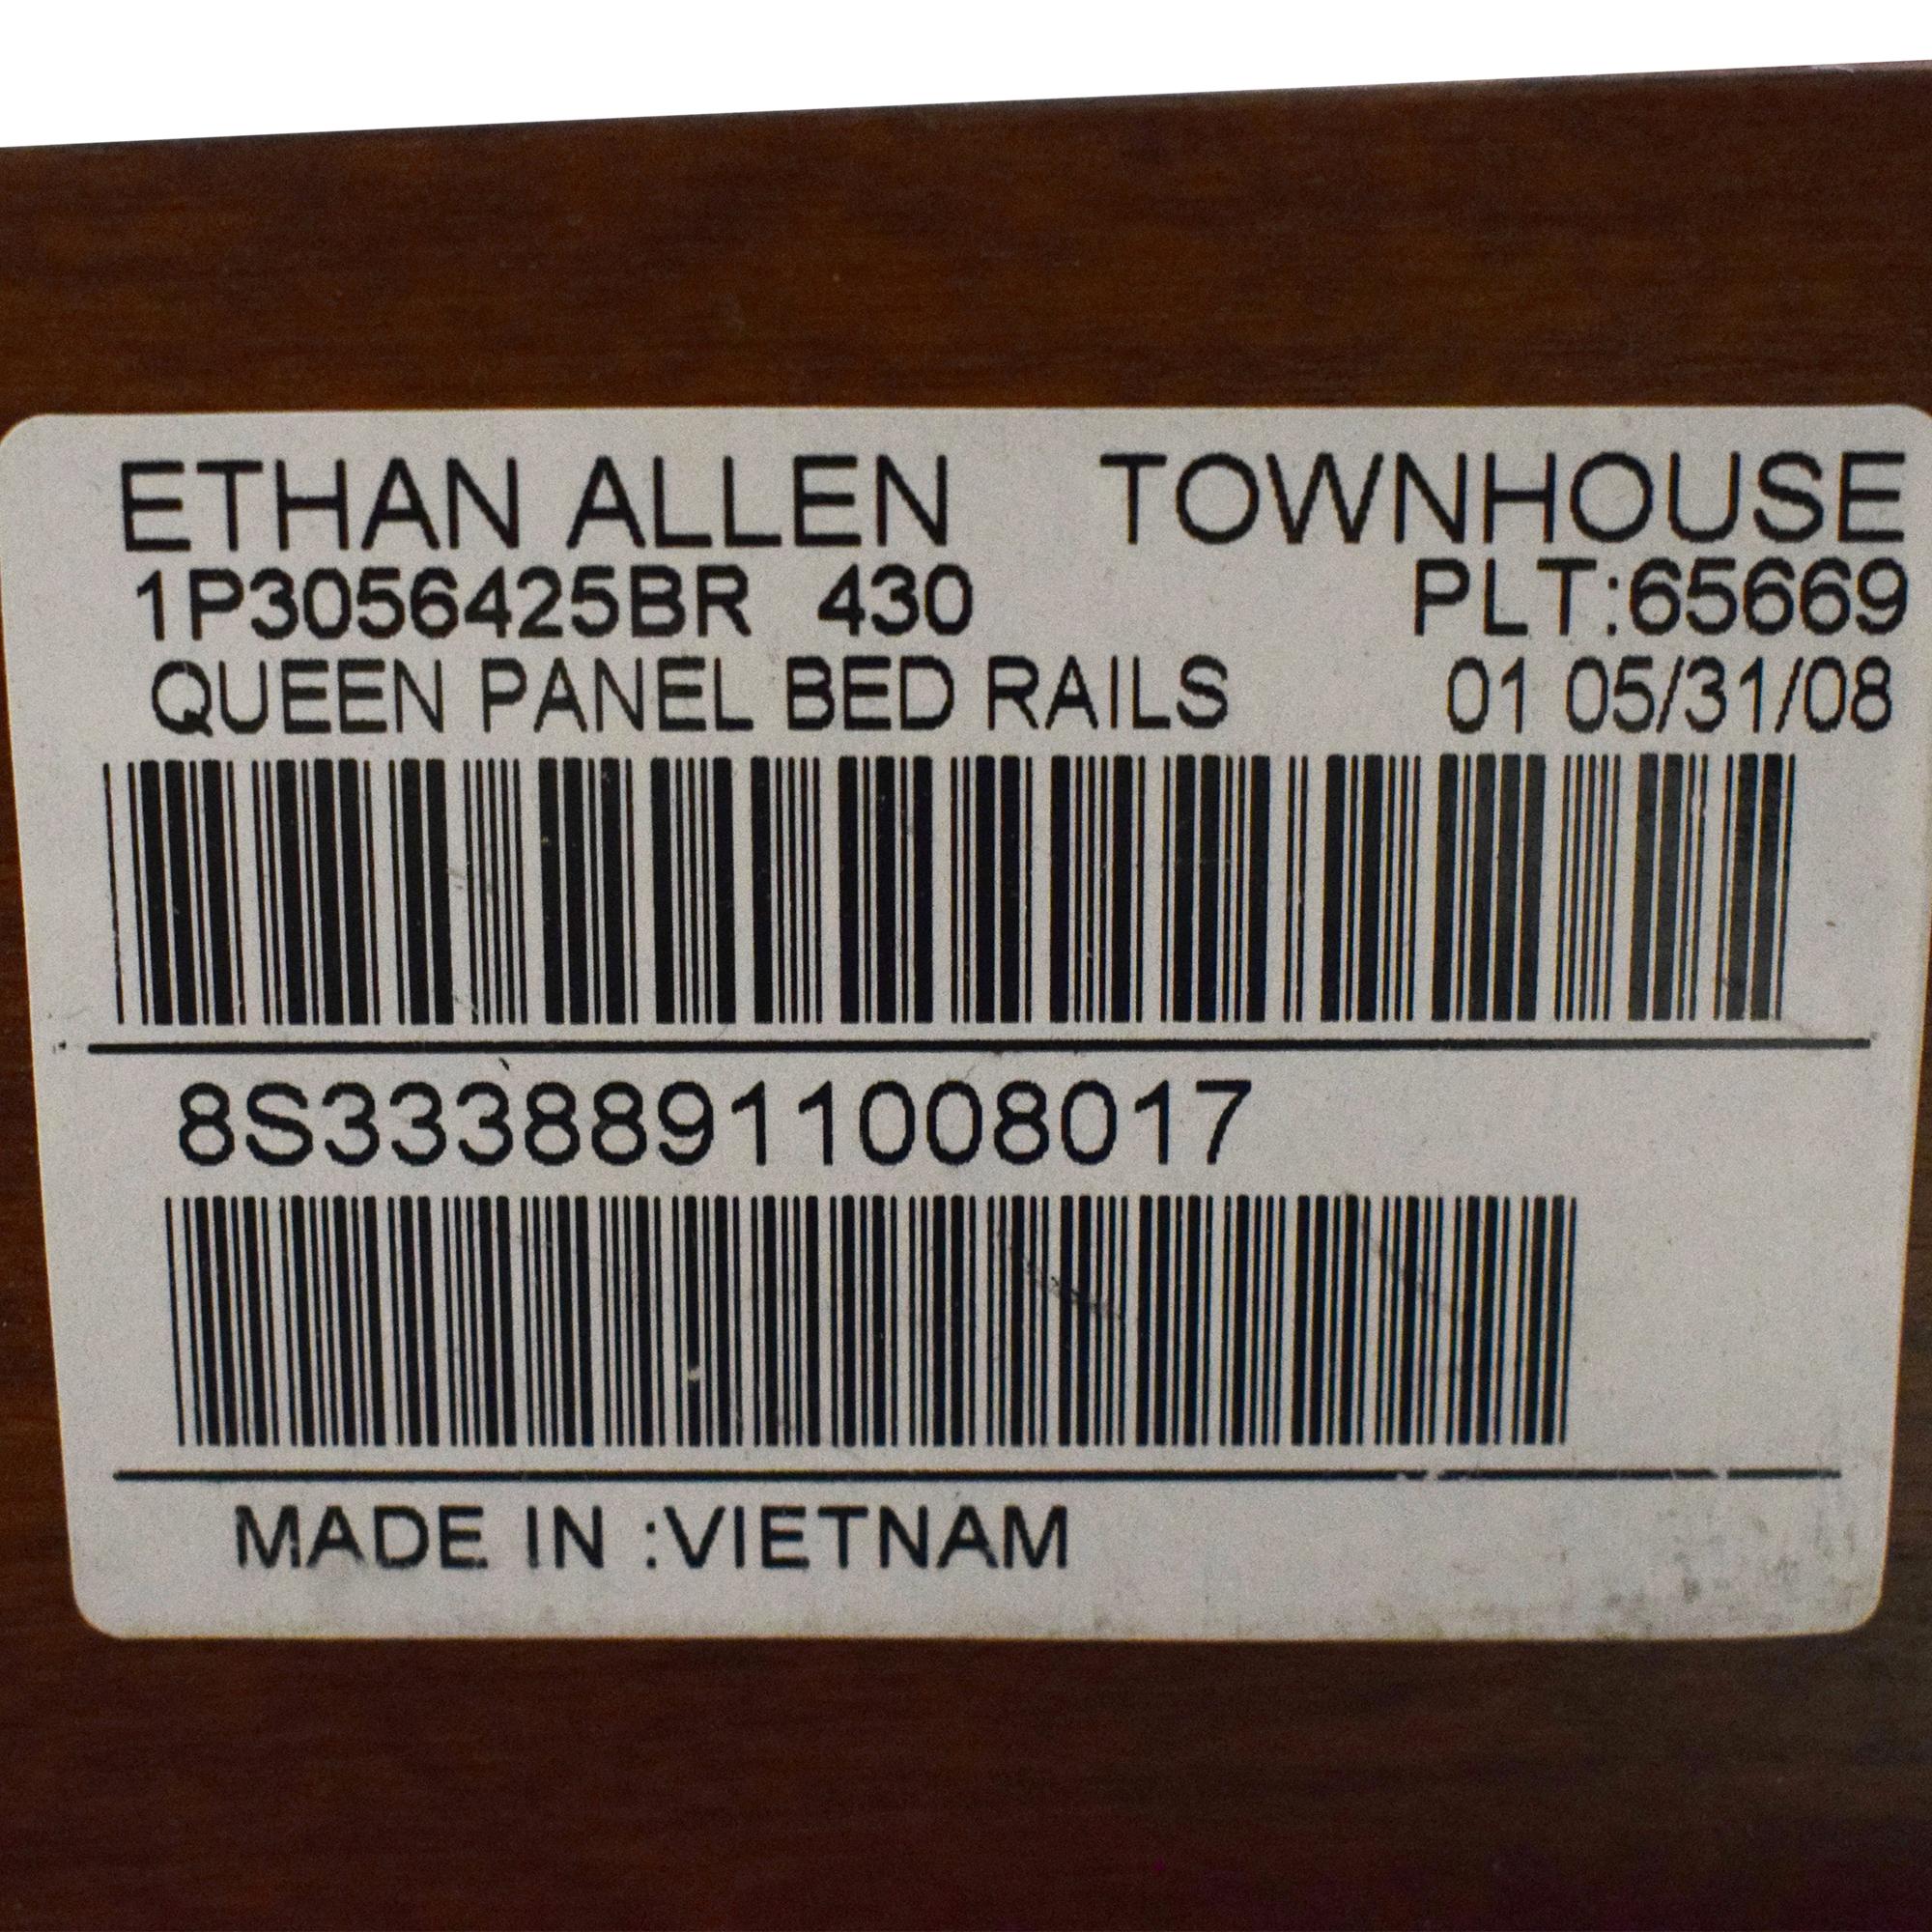 Ethan Allen Ethan Allen Townhouse Wentworth Queen Panel Bed brown